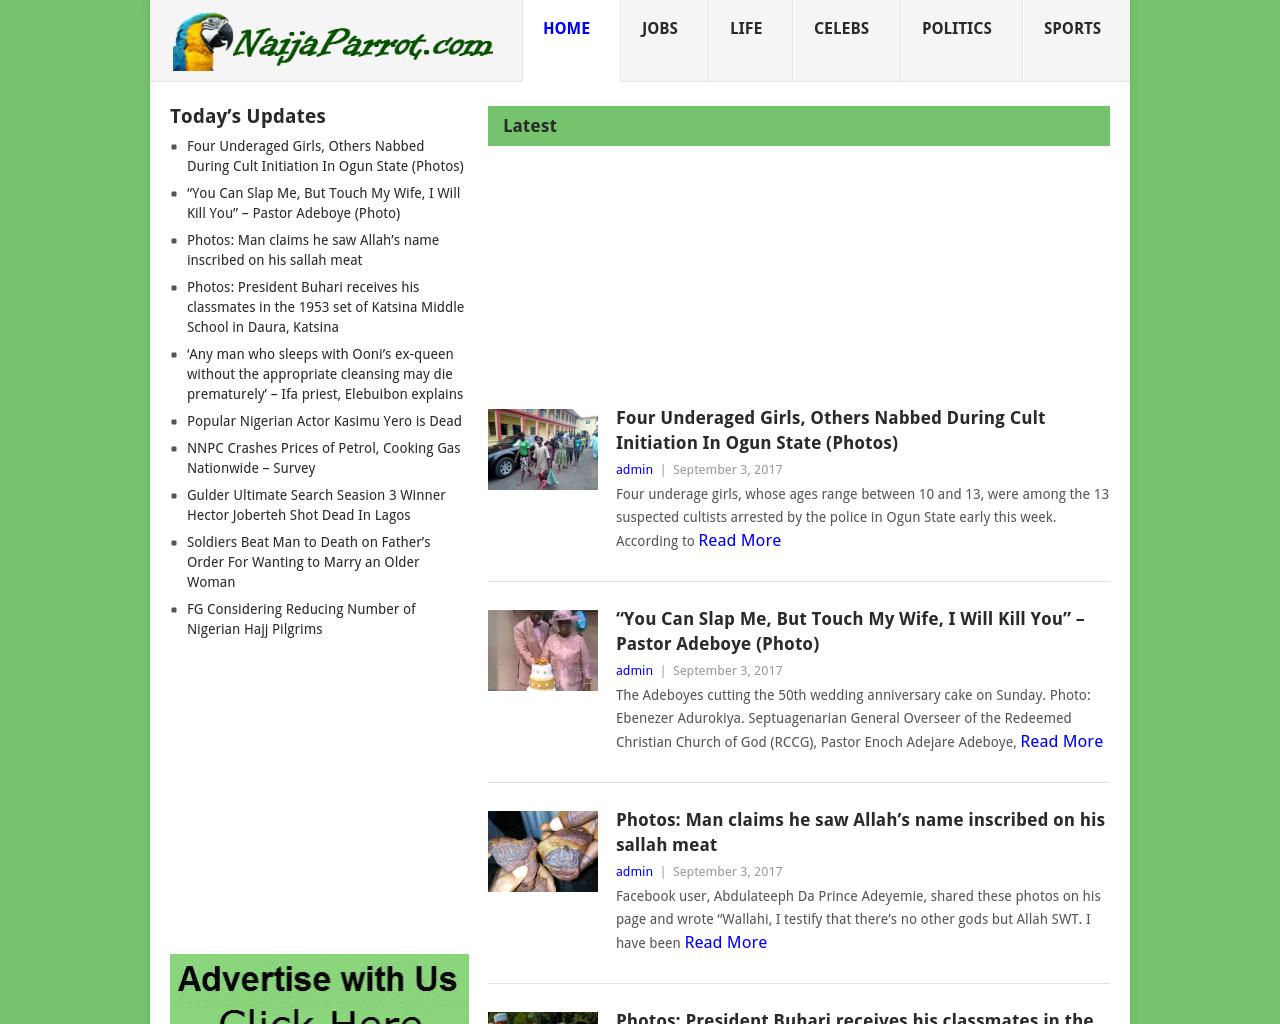 Naija-Parrot-Advertising-Reviews-Pricing